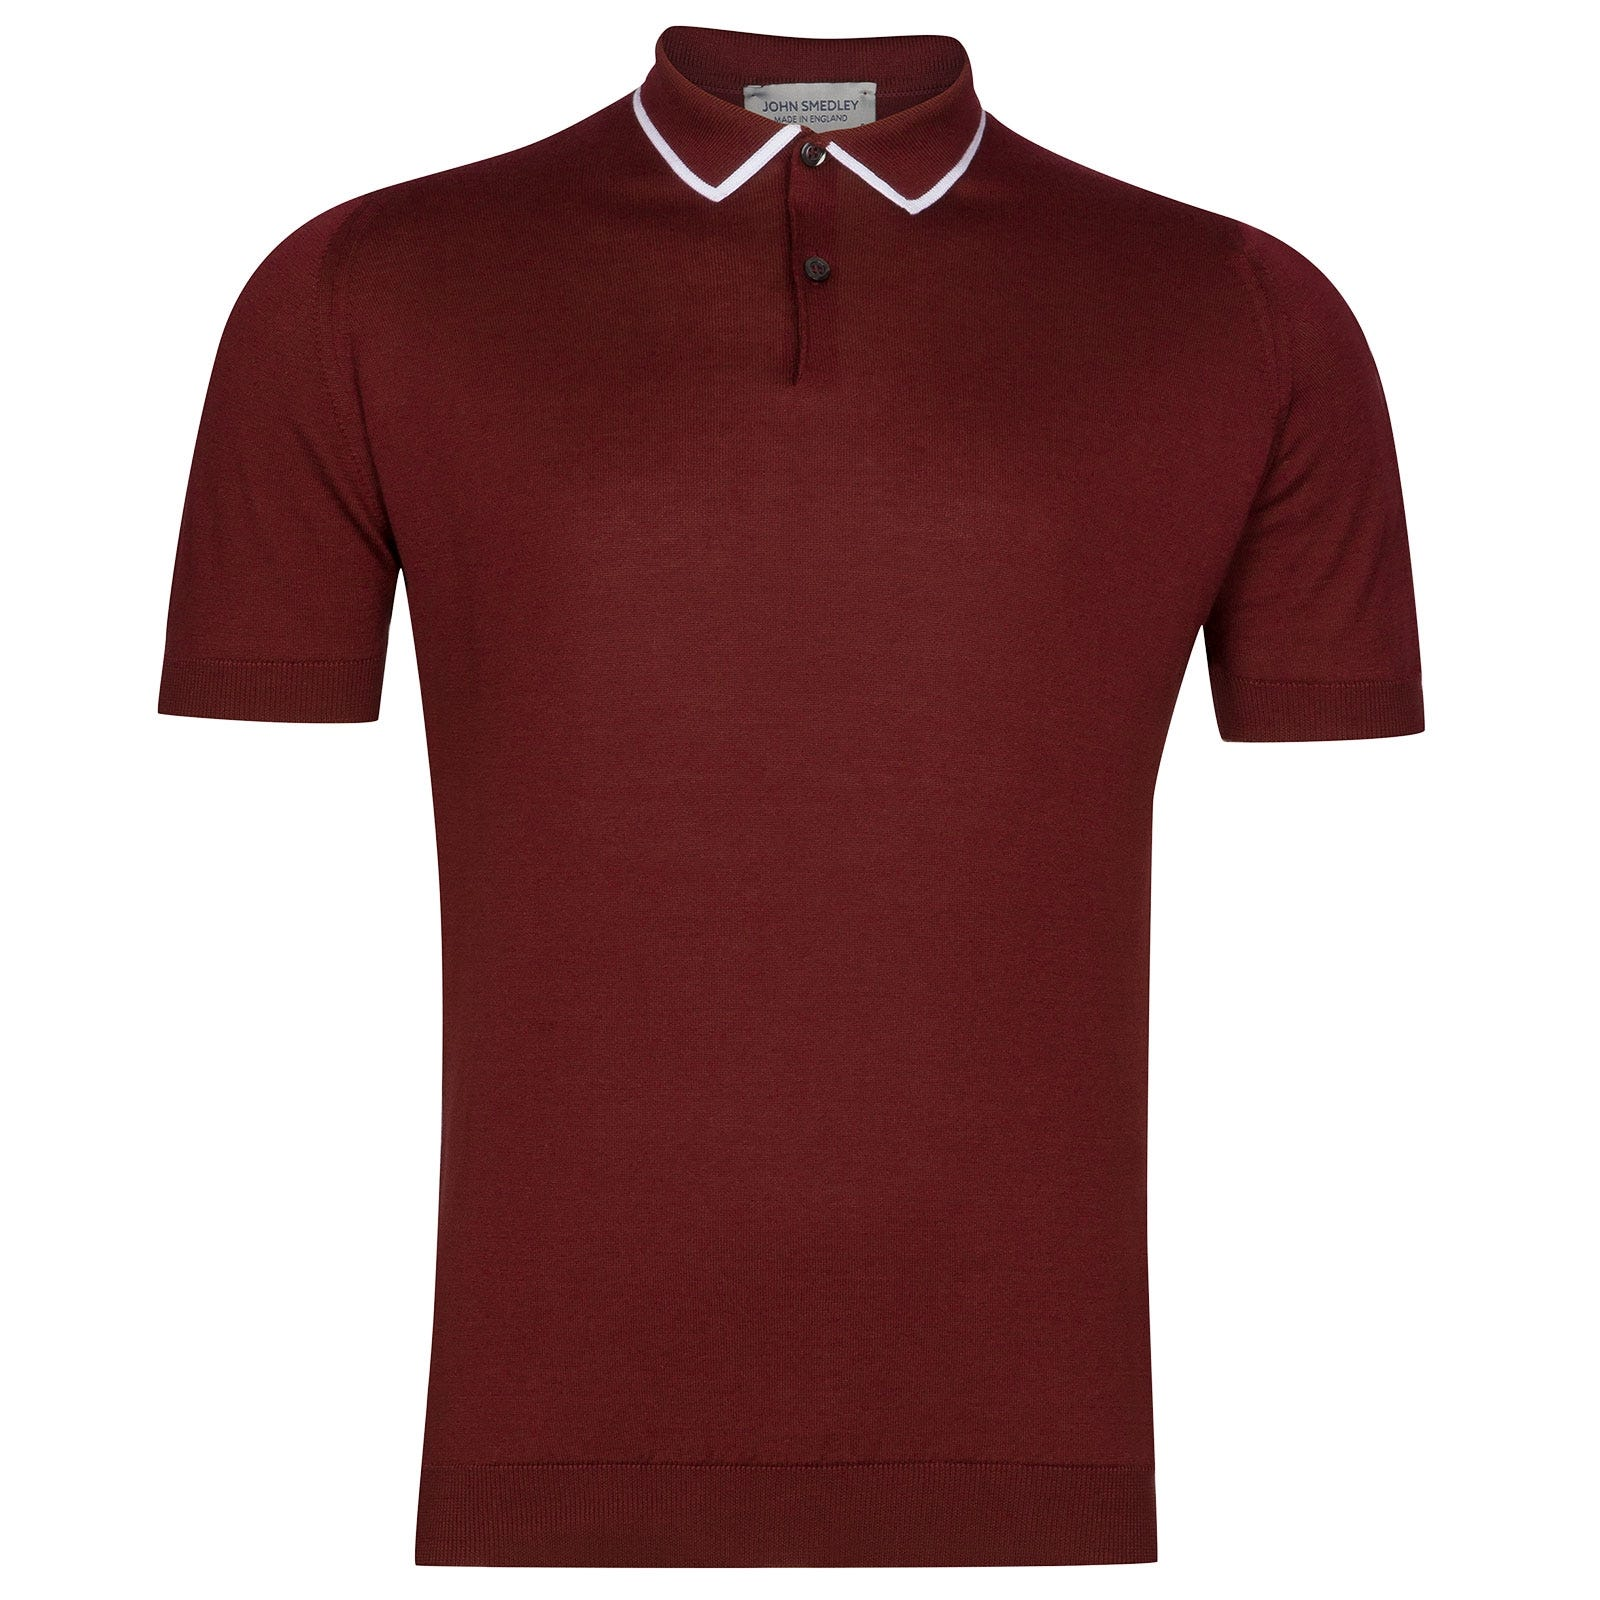 John Smedley Klerk Sea Island Cotton Shirt in Burgundy Grain-XL